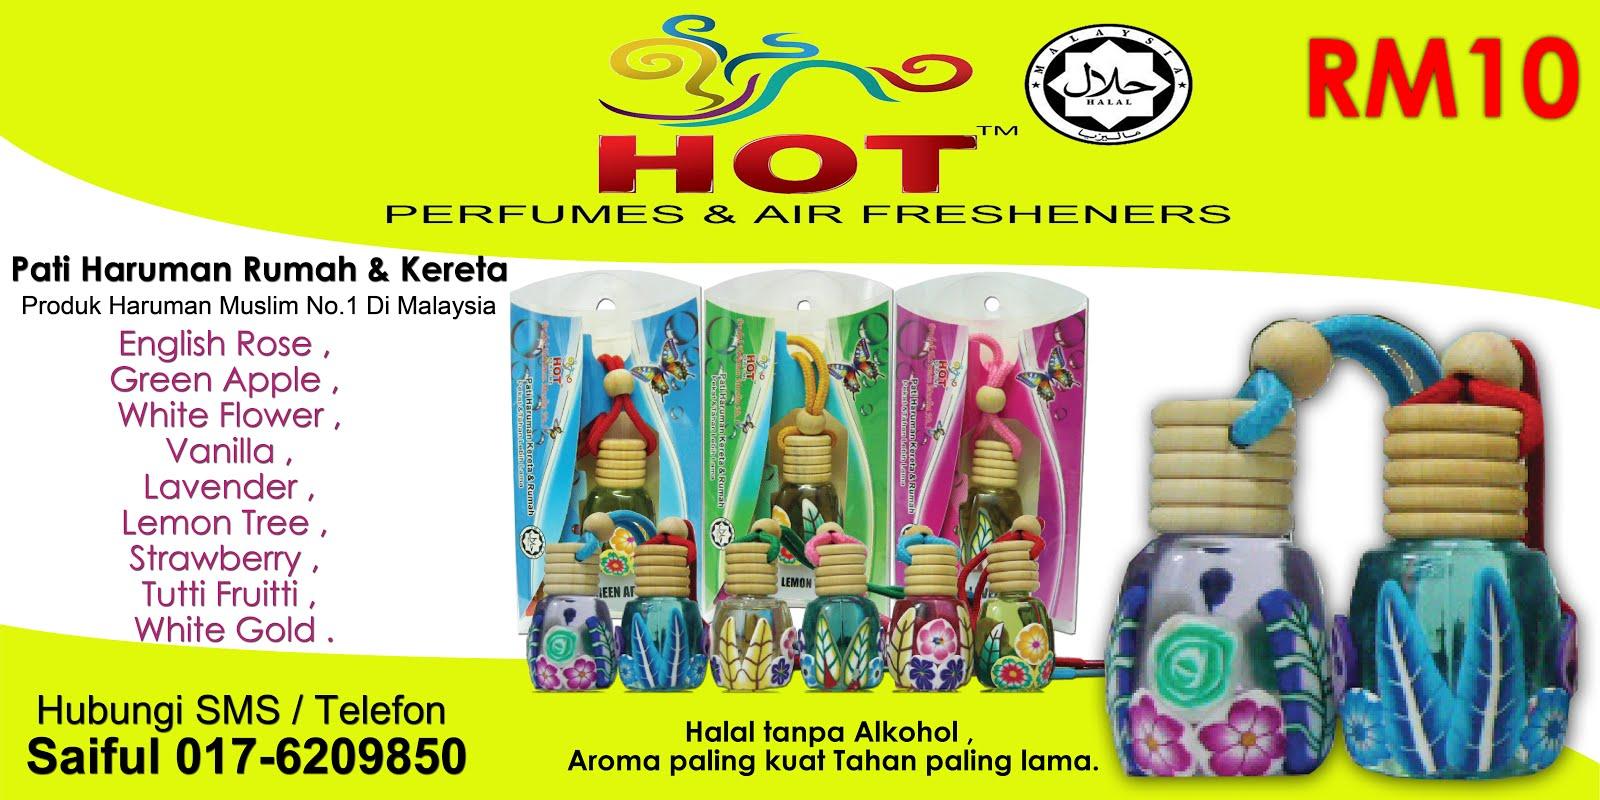 Pati Haruman Hot Perfumes and Air Fresheners